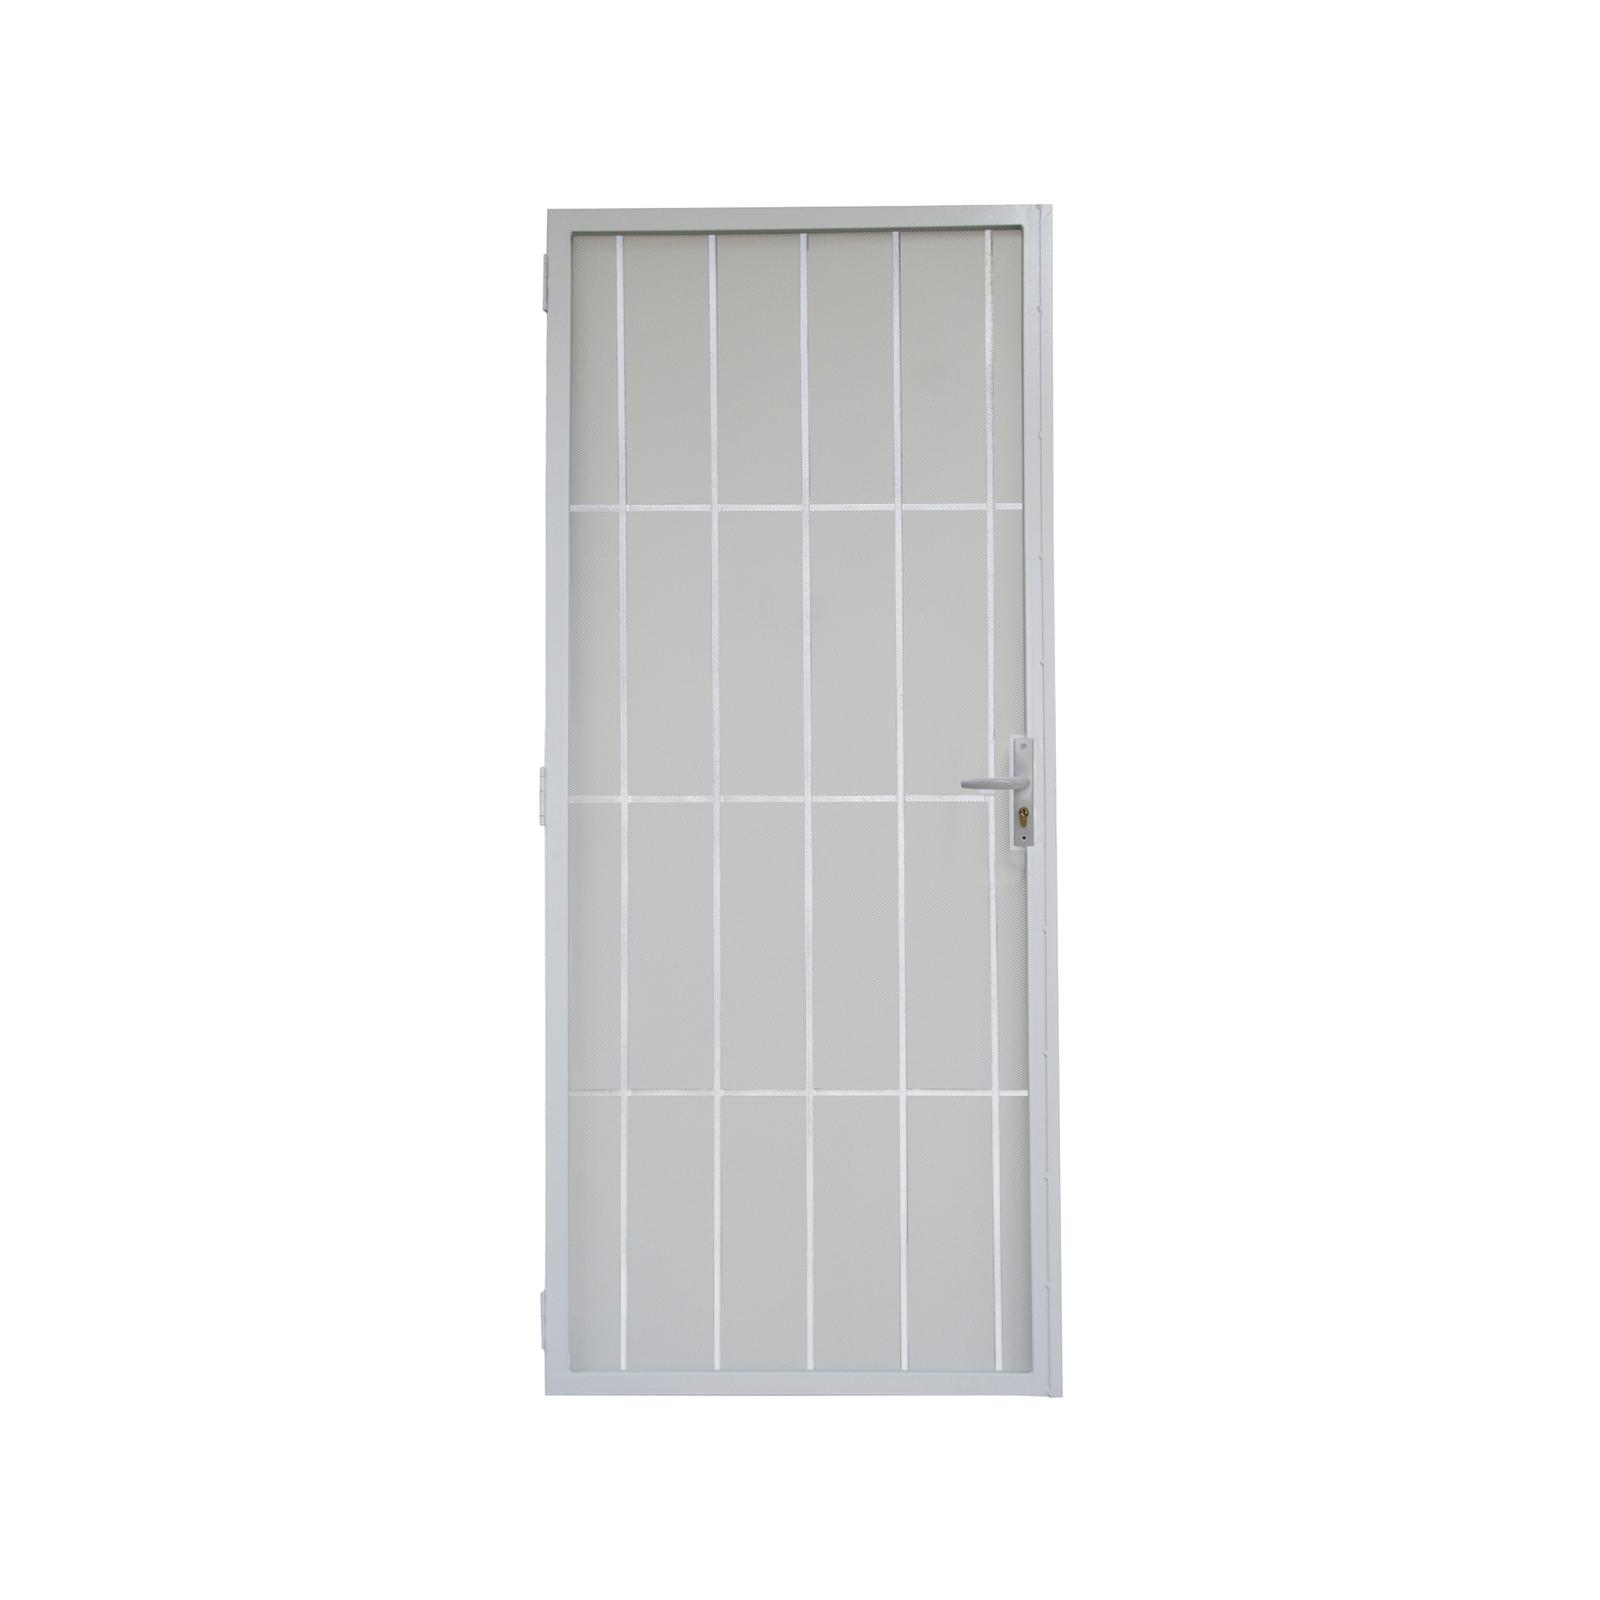 Pillar 2024 x 806mm Imperial White Classic Steel Frame Door Screen